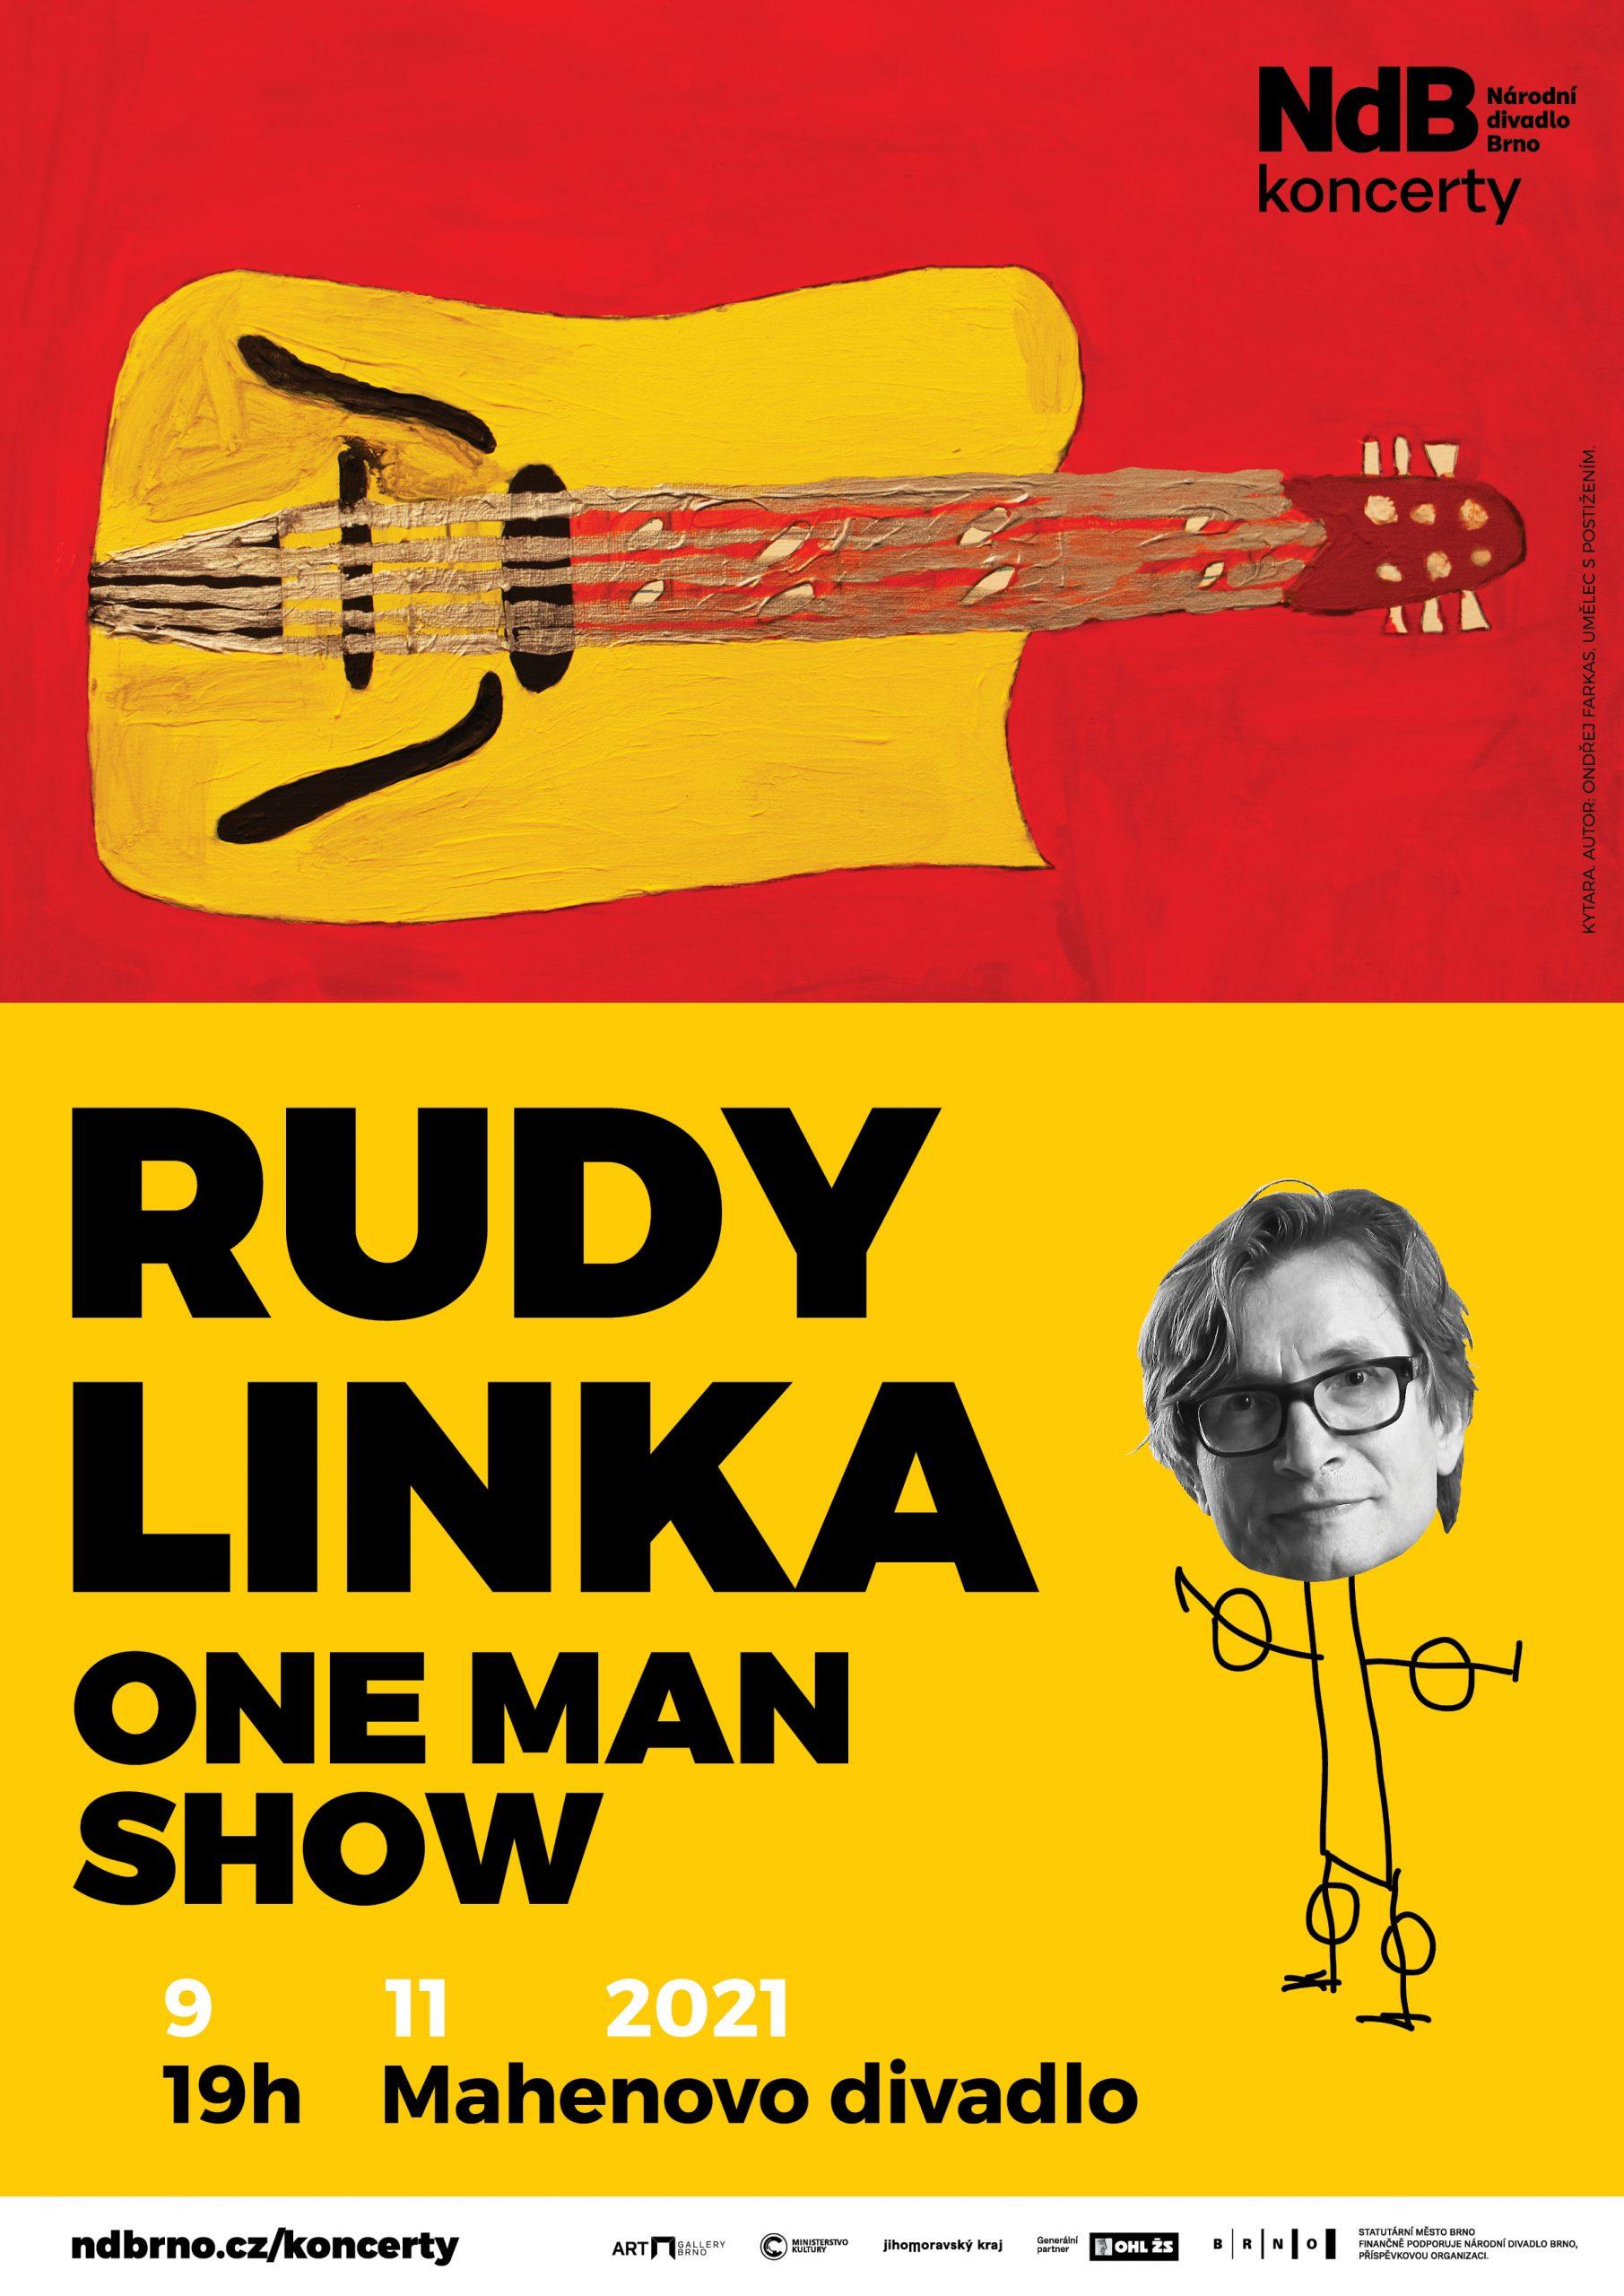 Rudy Linka – One man show